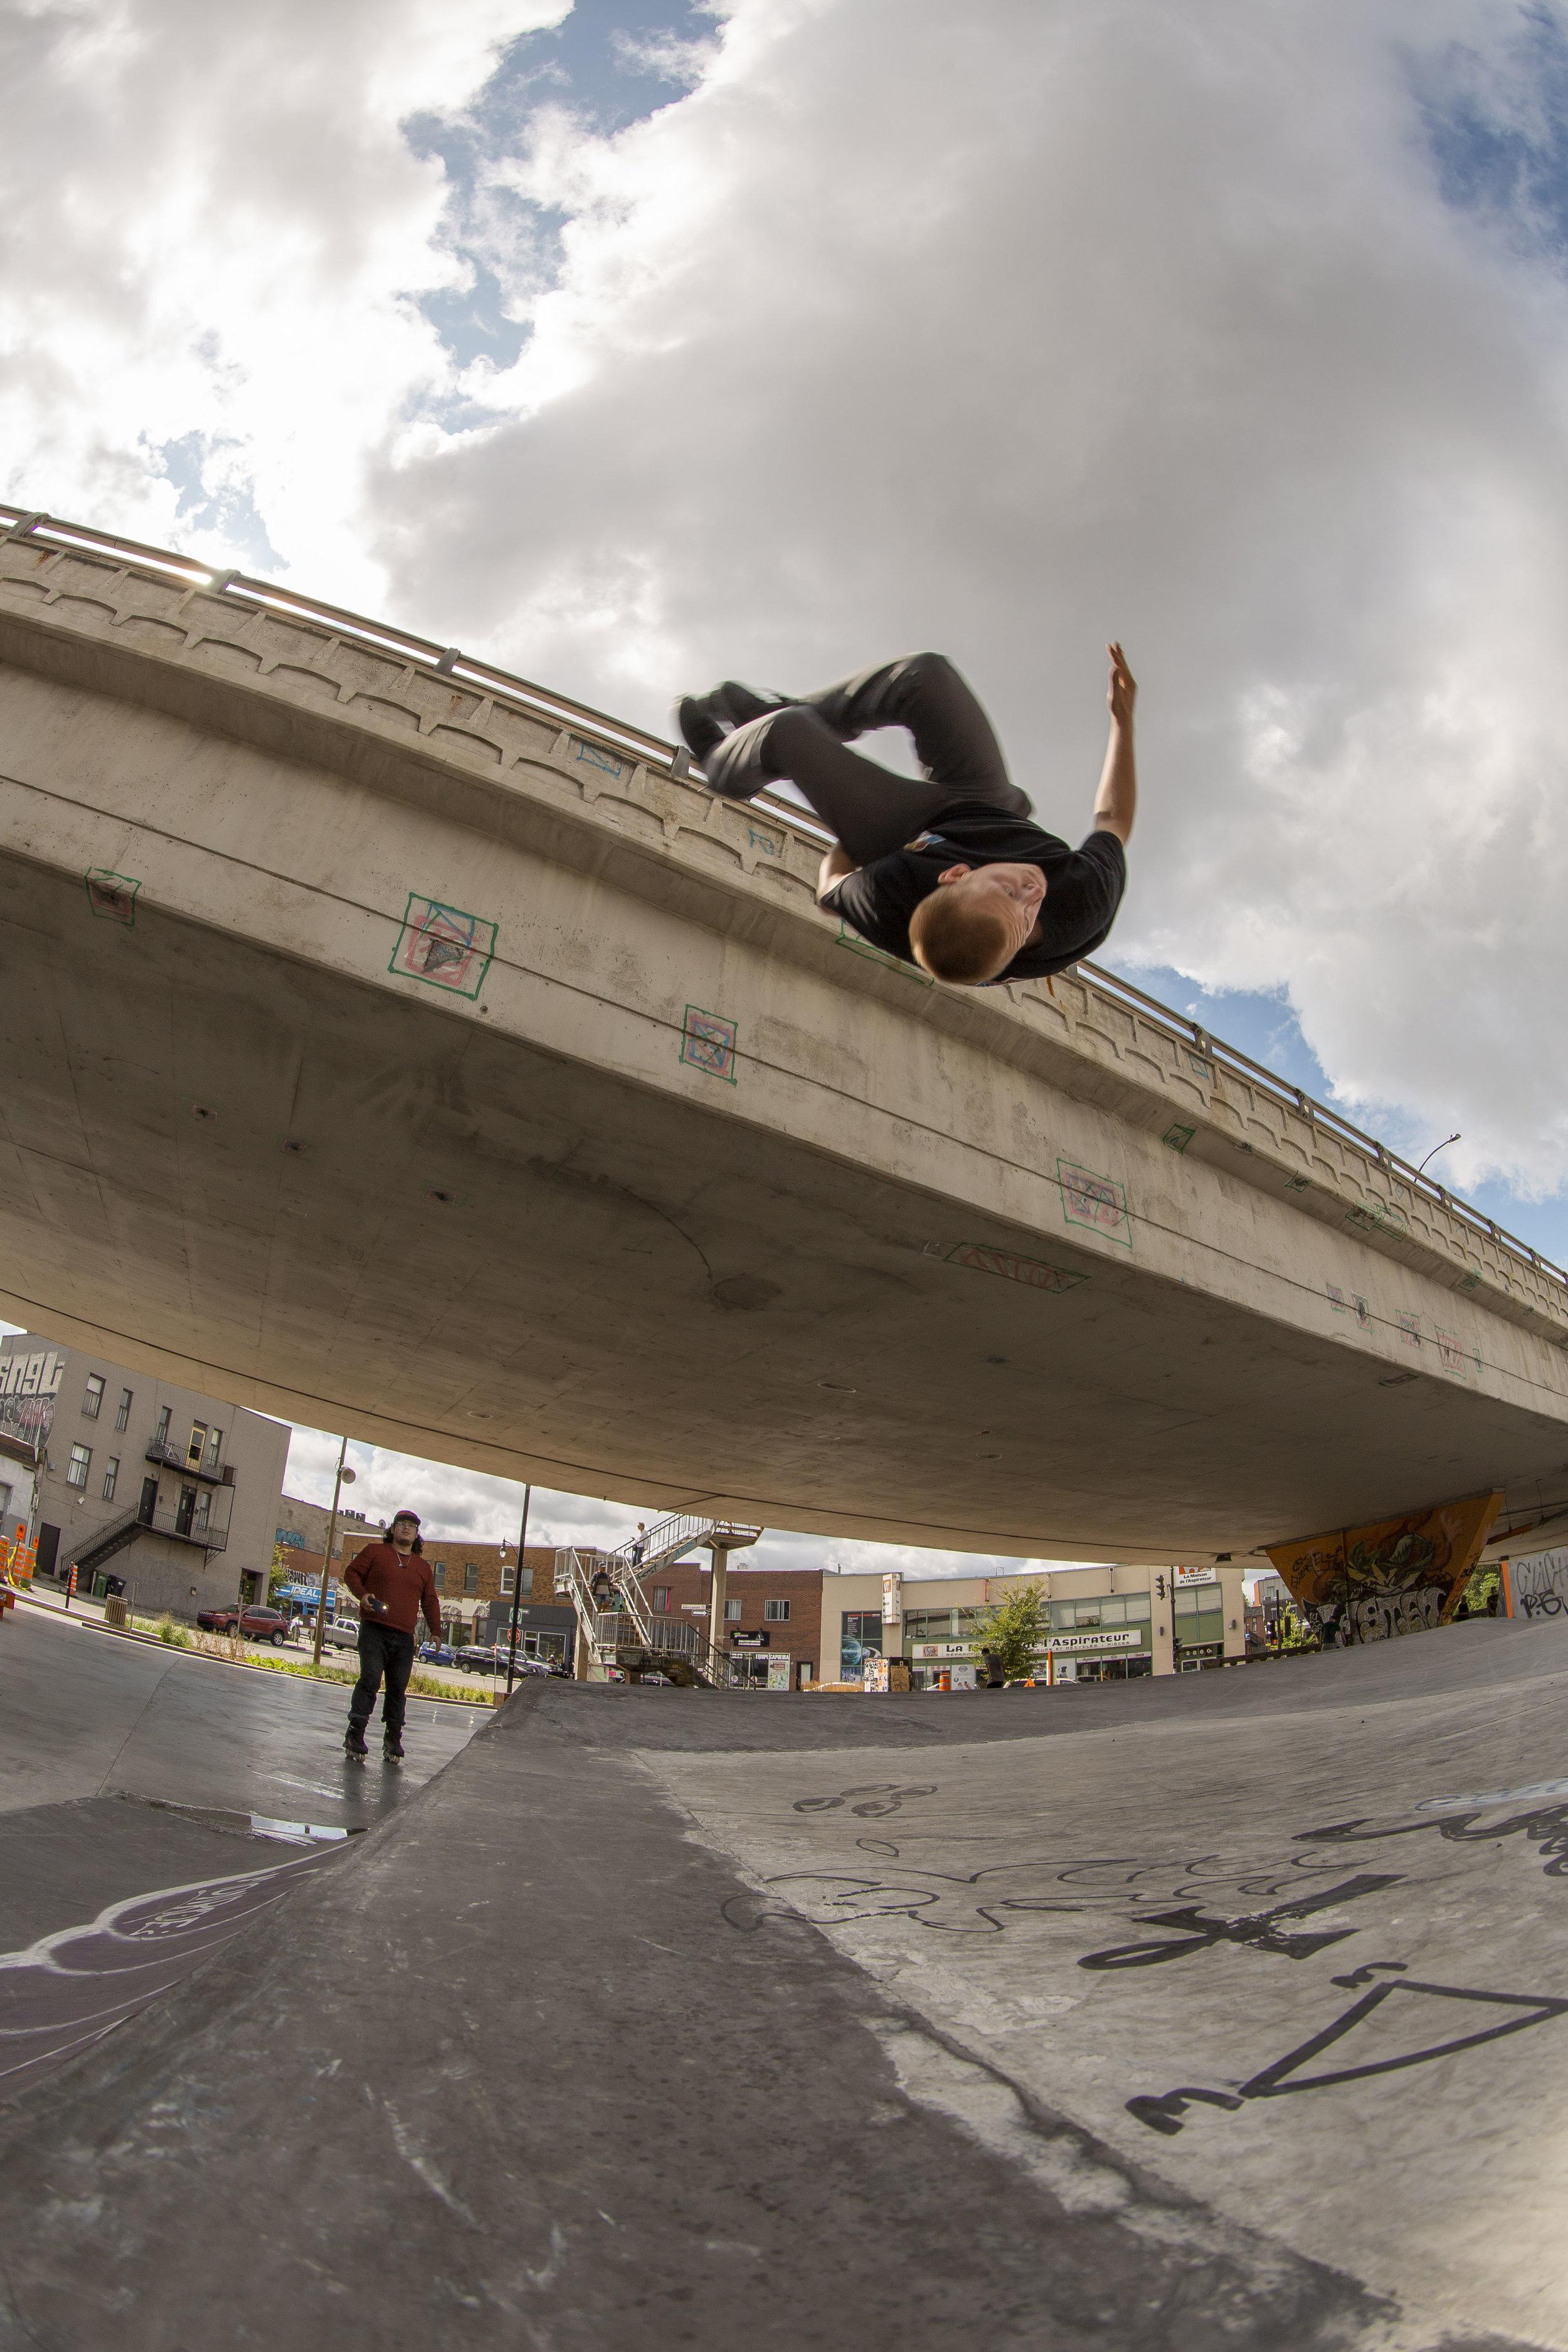 Yoeri Kurvers - Misty Flip Photo: Thomas Camus